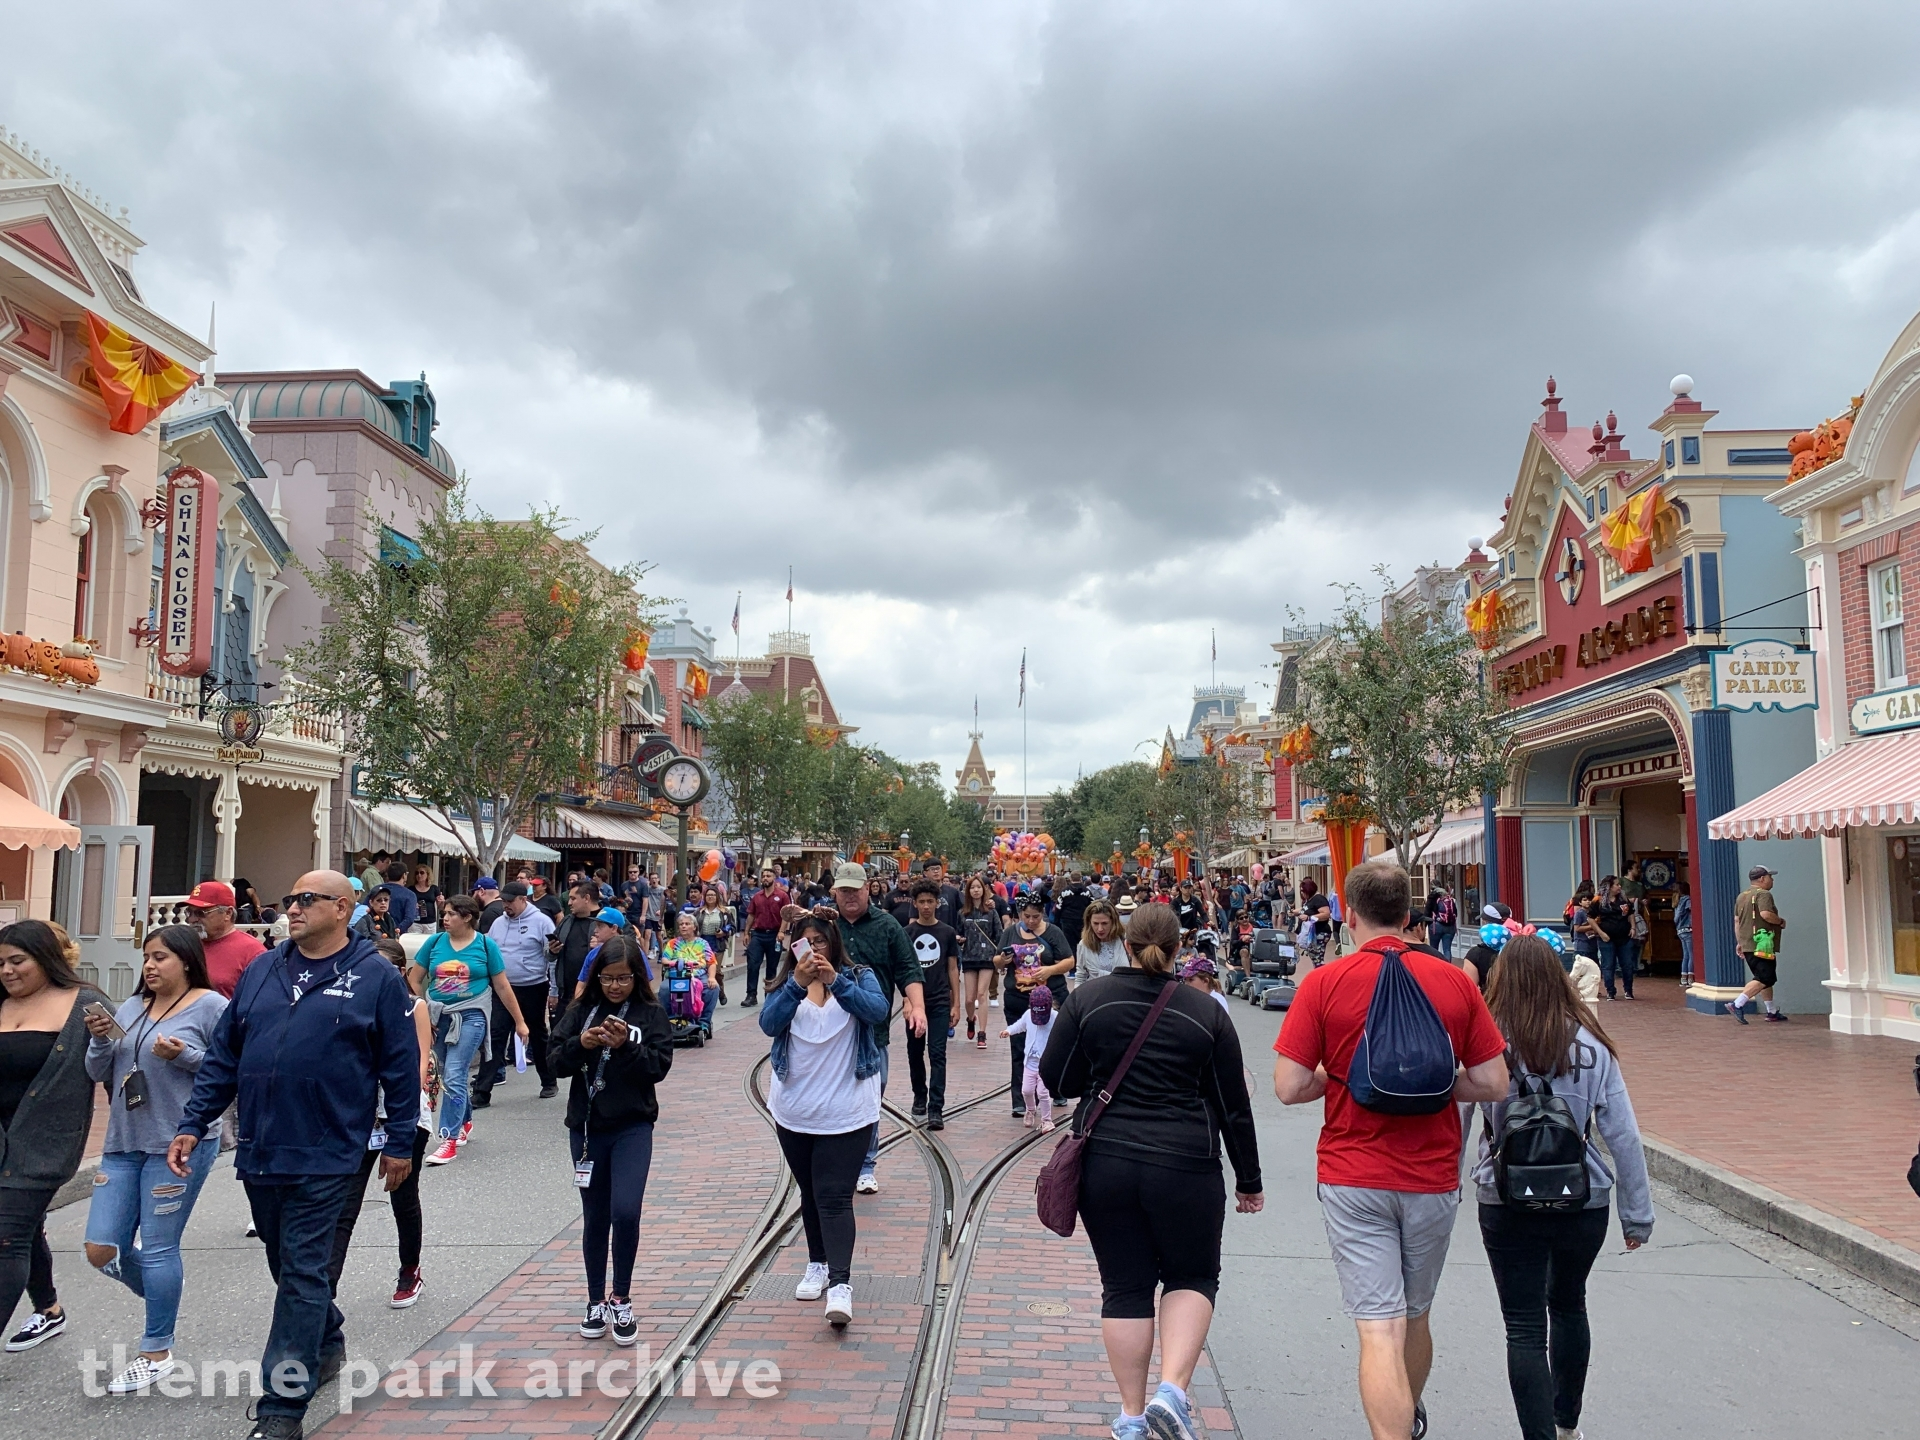 Main Street U.S.A. at Disneyland